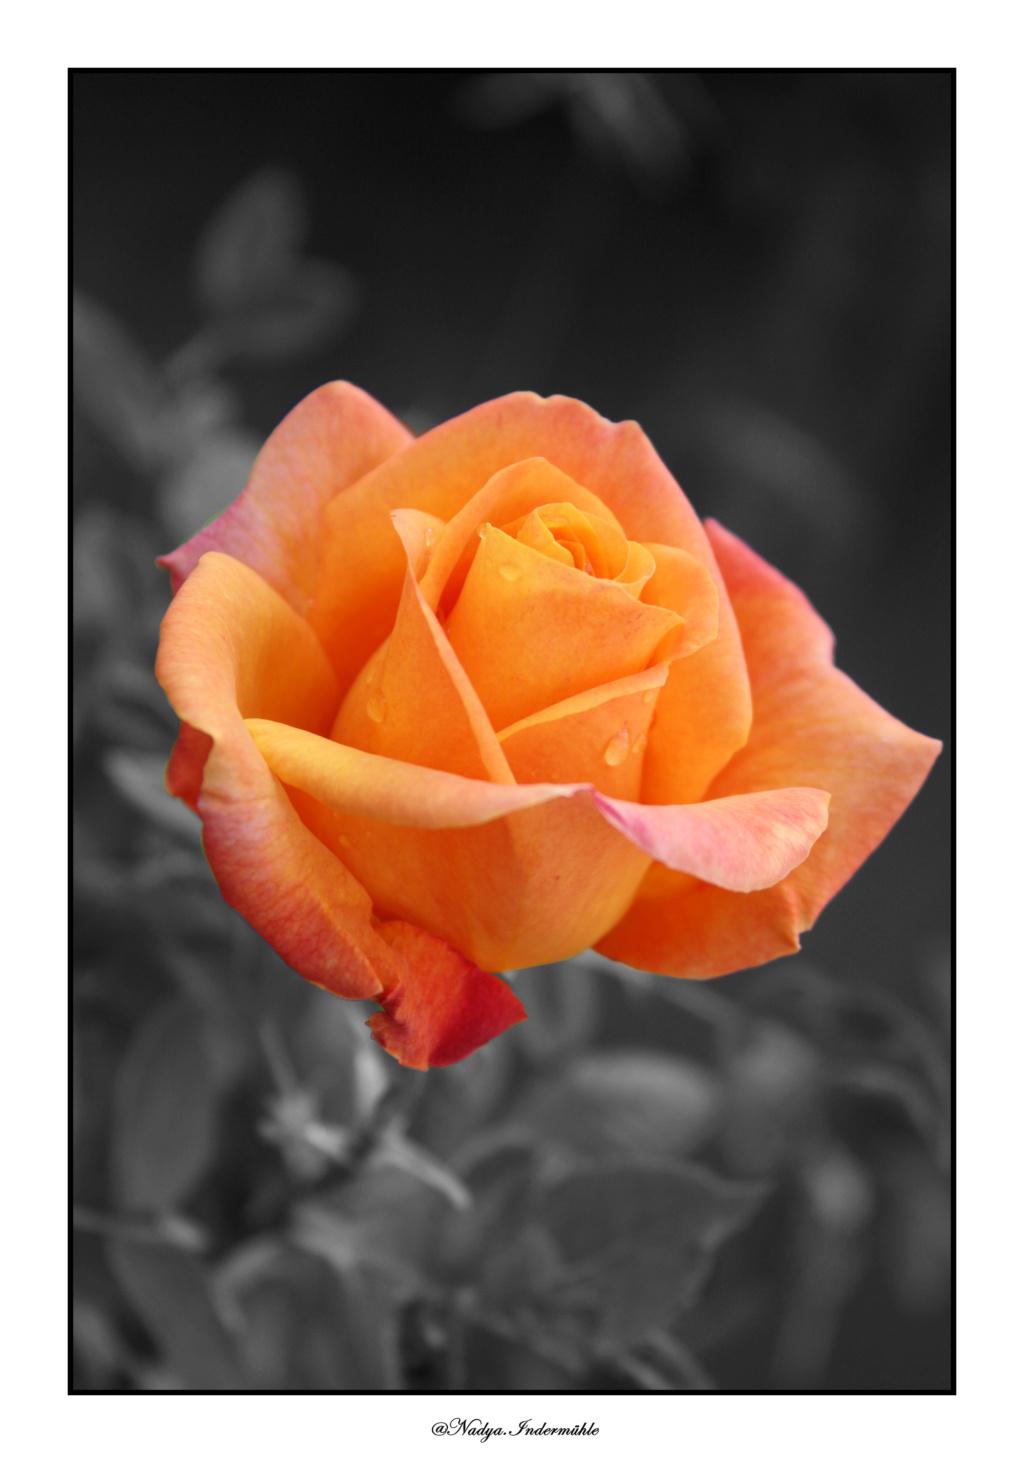 Ma roseraie - Page 2 Avant_10